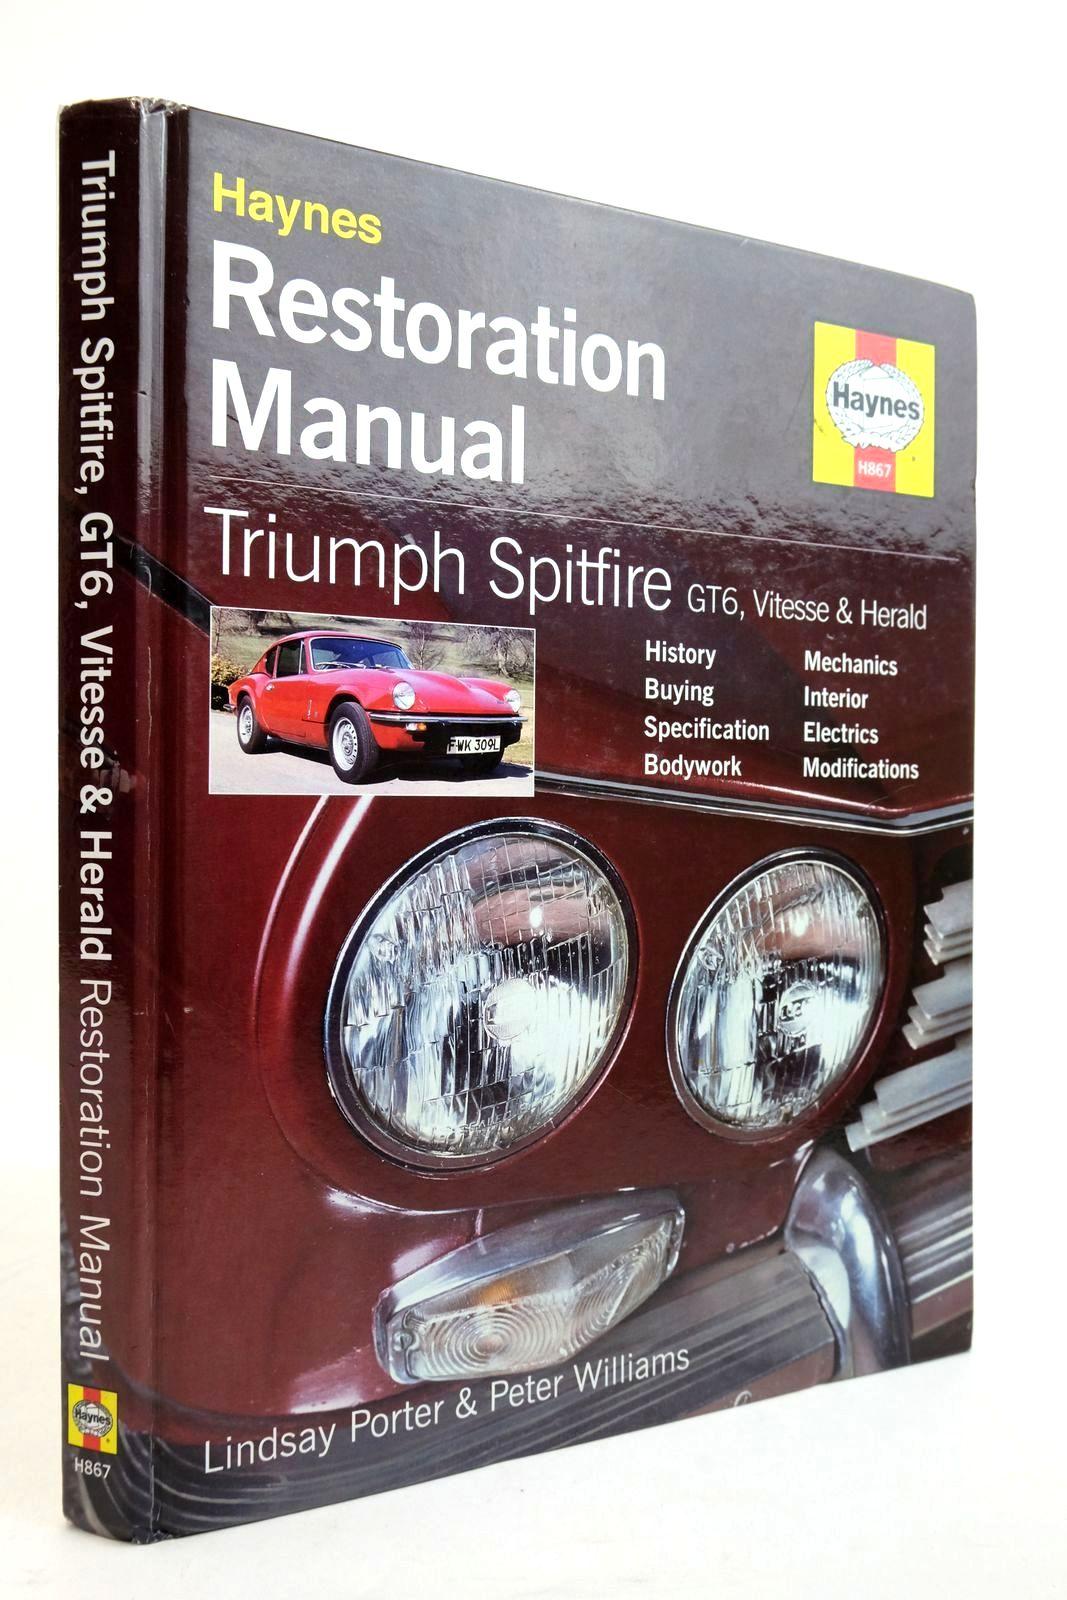 Photo of HAYNES RESTORATION MANUAL: TRIUMPH SPITFIRE GT6, VITESSE & HERALD- Stock Number: 2134920